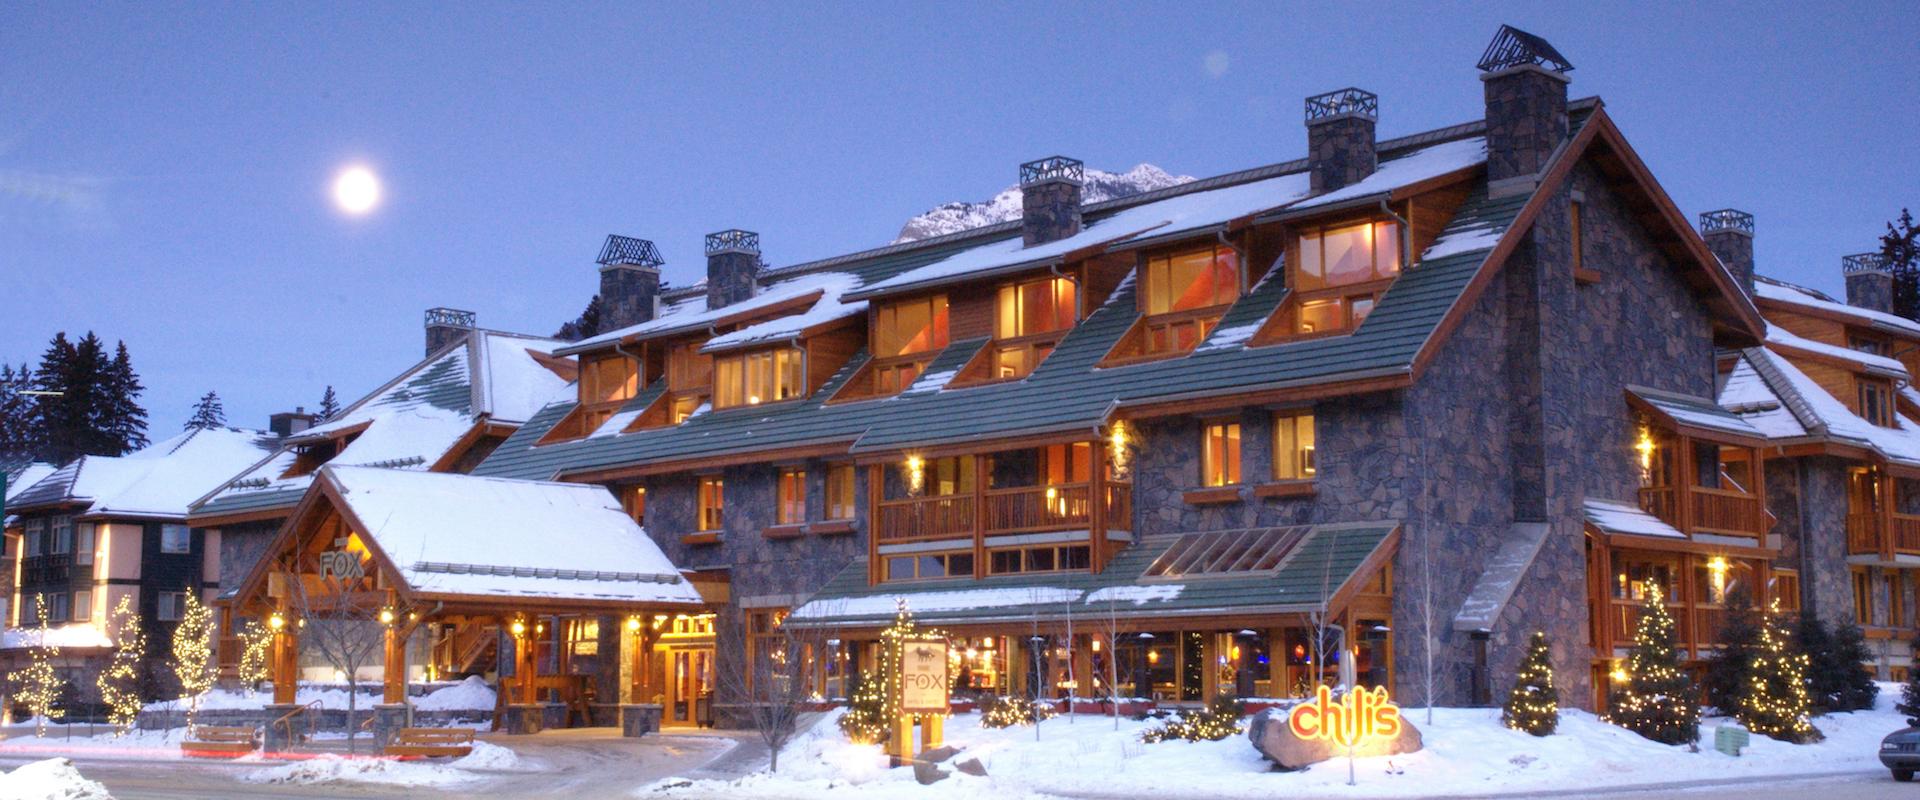 Fox Hotel Exterior in Winter in Banff, Canadian Rockies